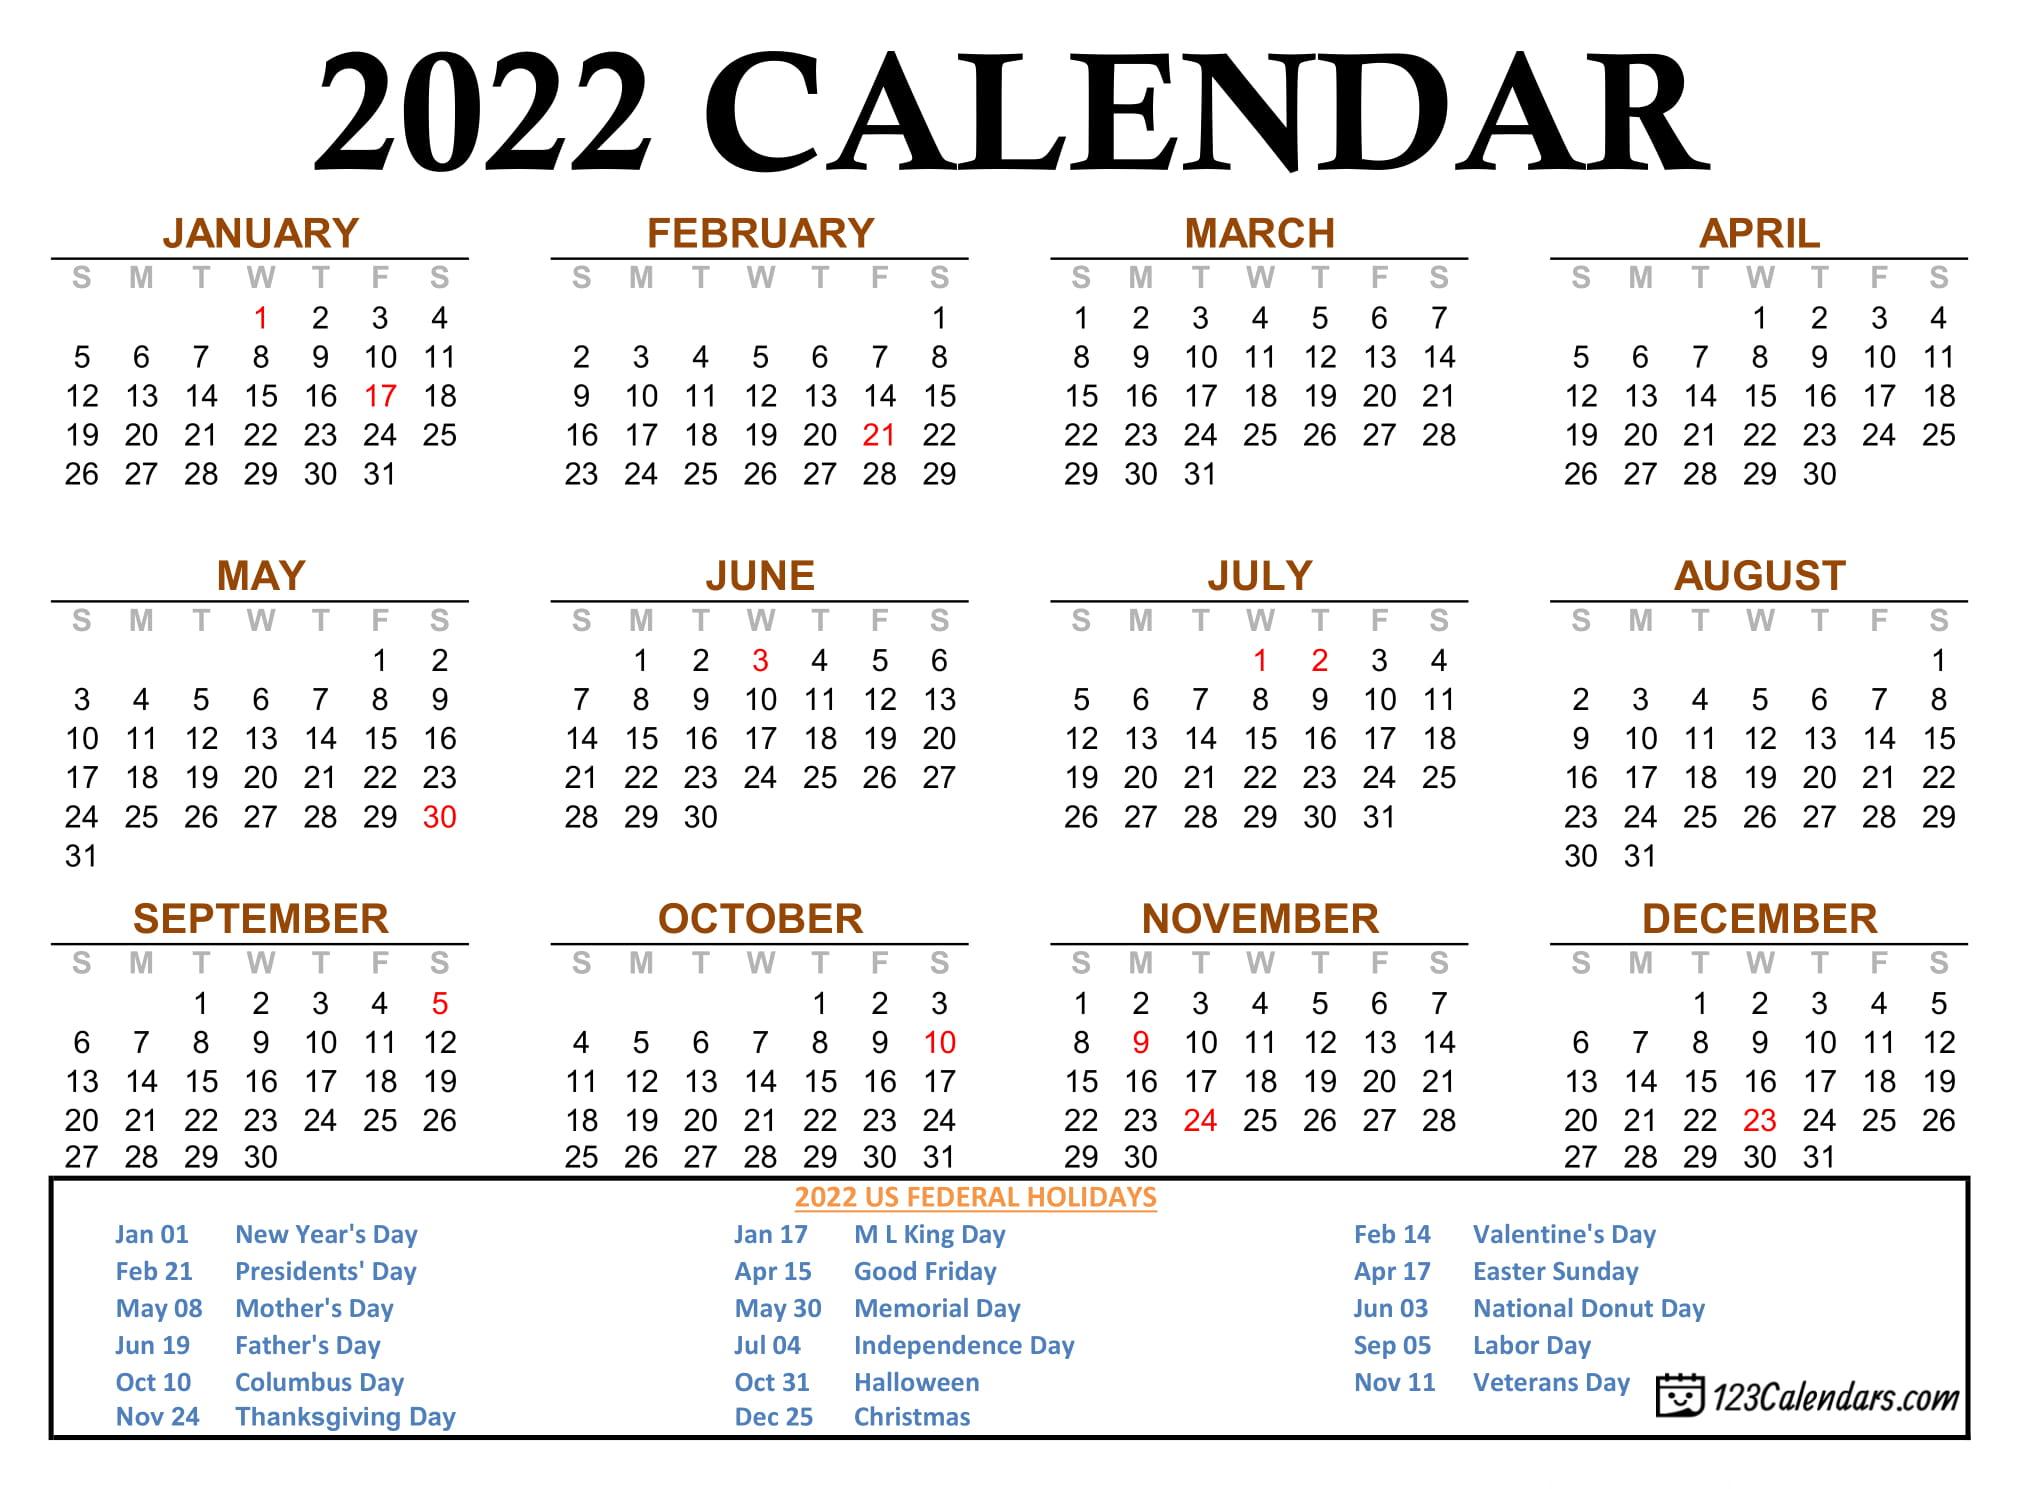 Year 2022 Calendar Templates | 123Calendars.com